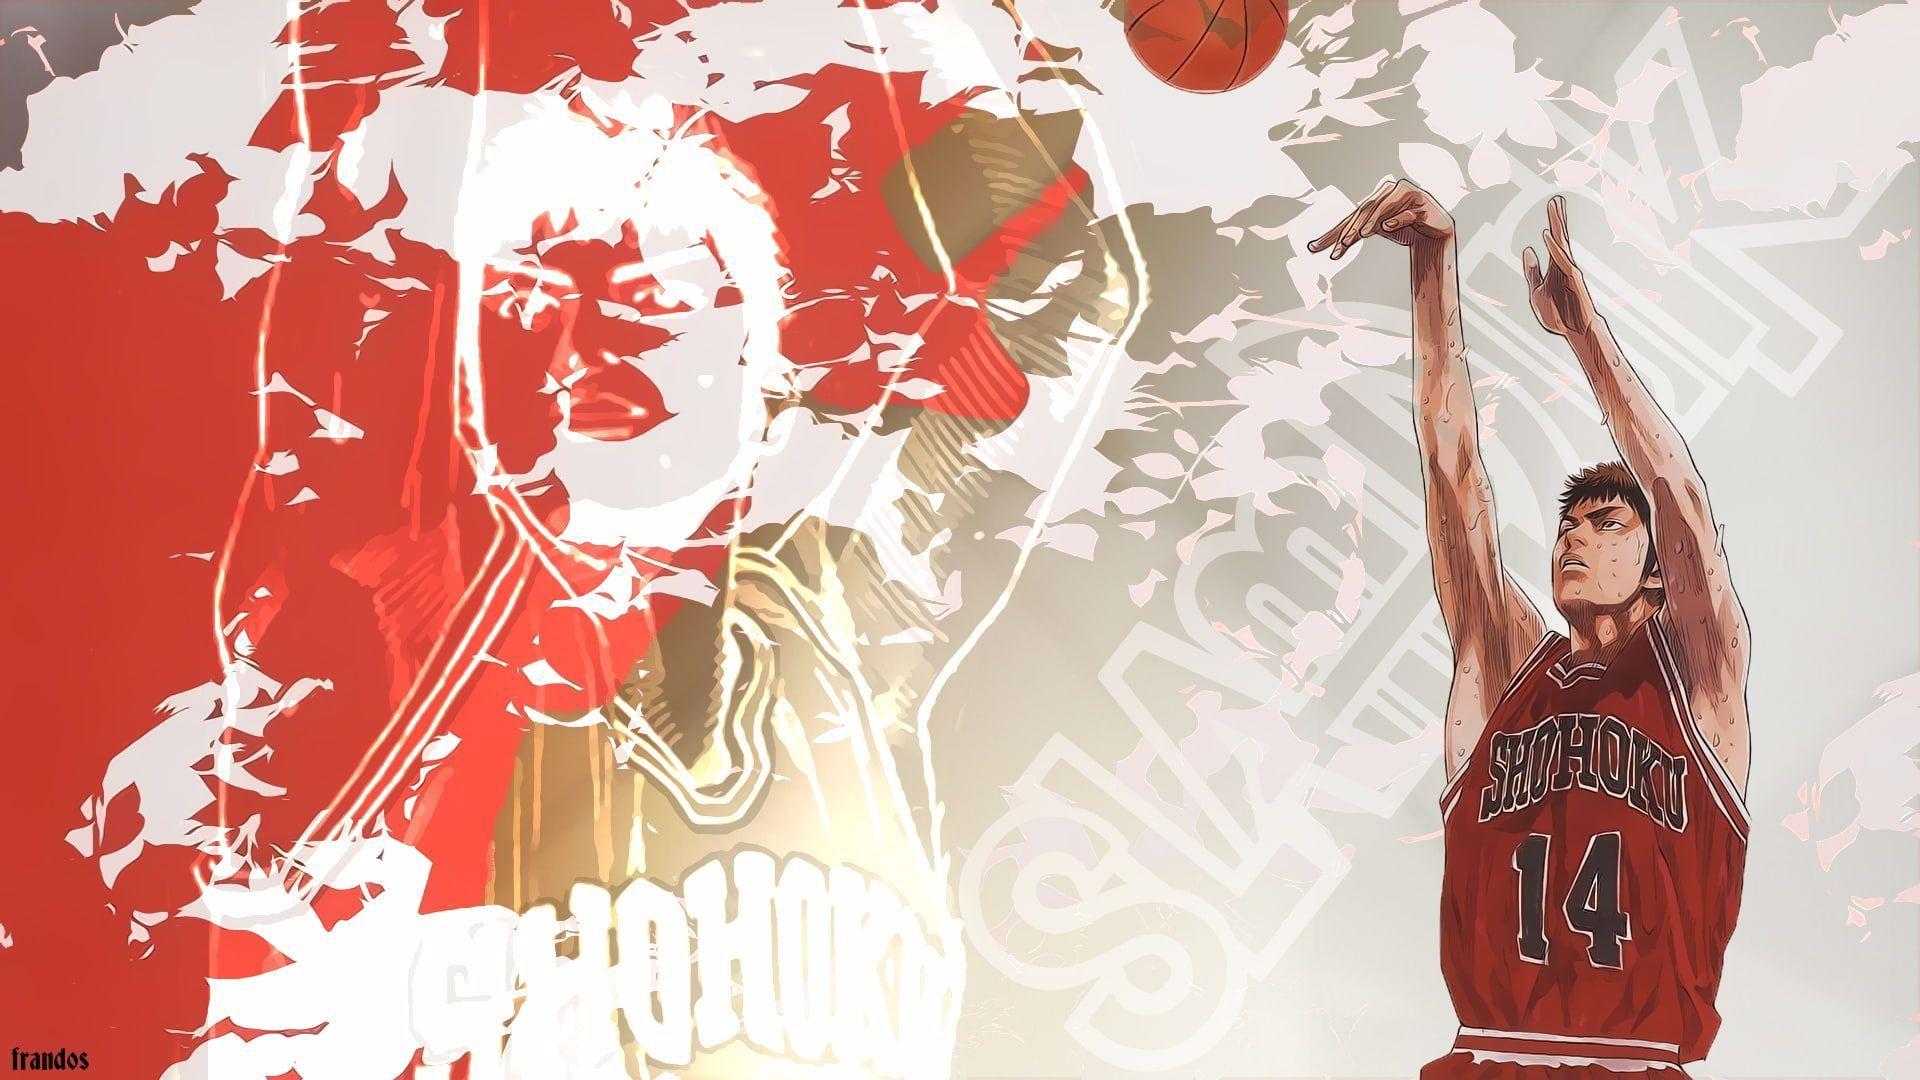 Slam Dunk Hisashi Mitsui Basketball Anime 1080p Wallpaper Hdwallpaper Desktop In 2020 Slam Dunk Anime Slam Dunk Anime Wallpaper